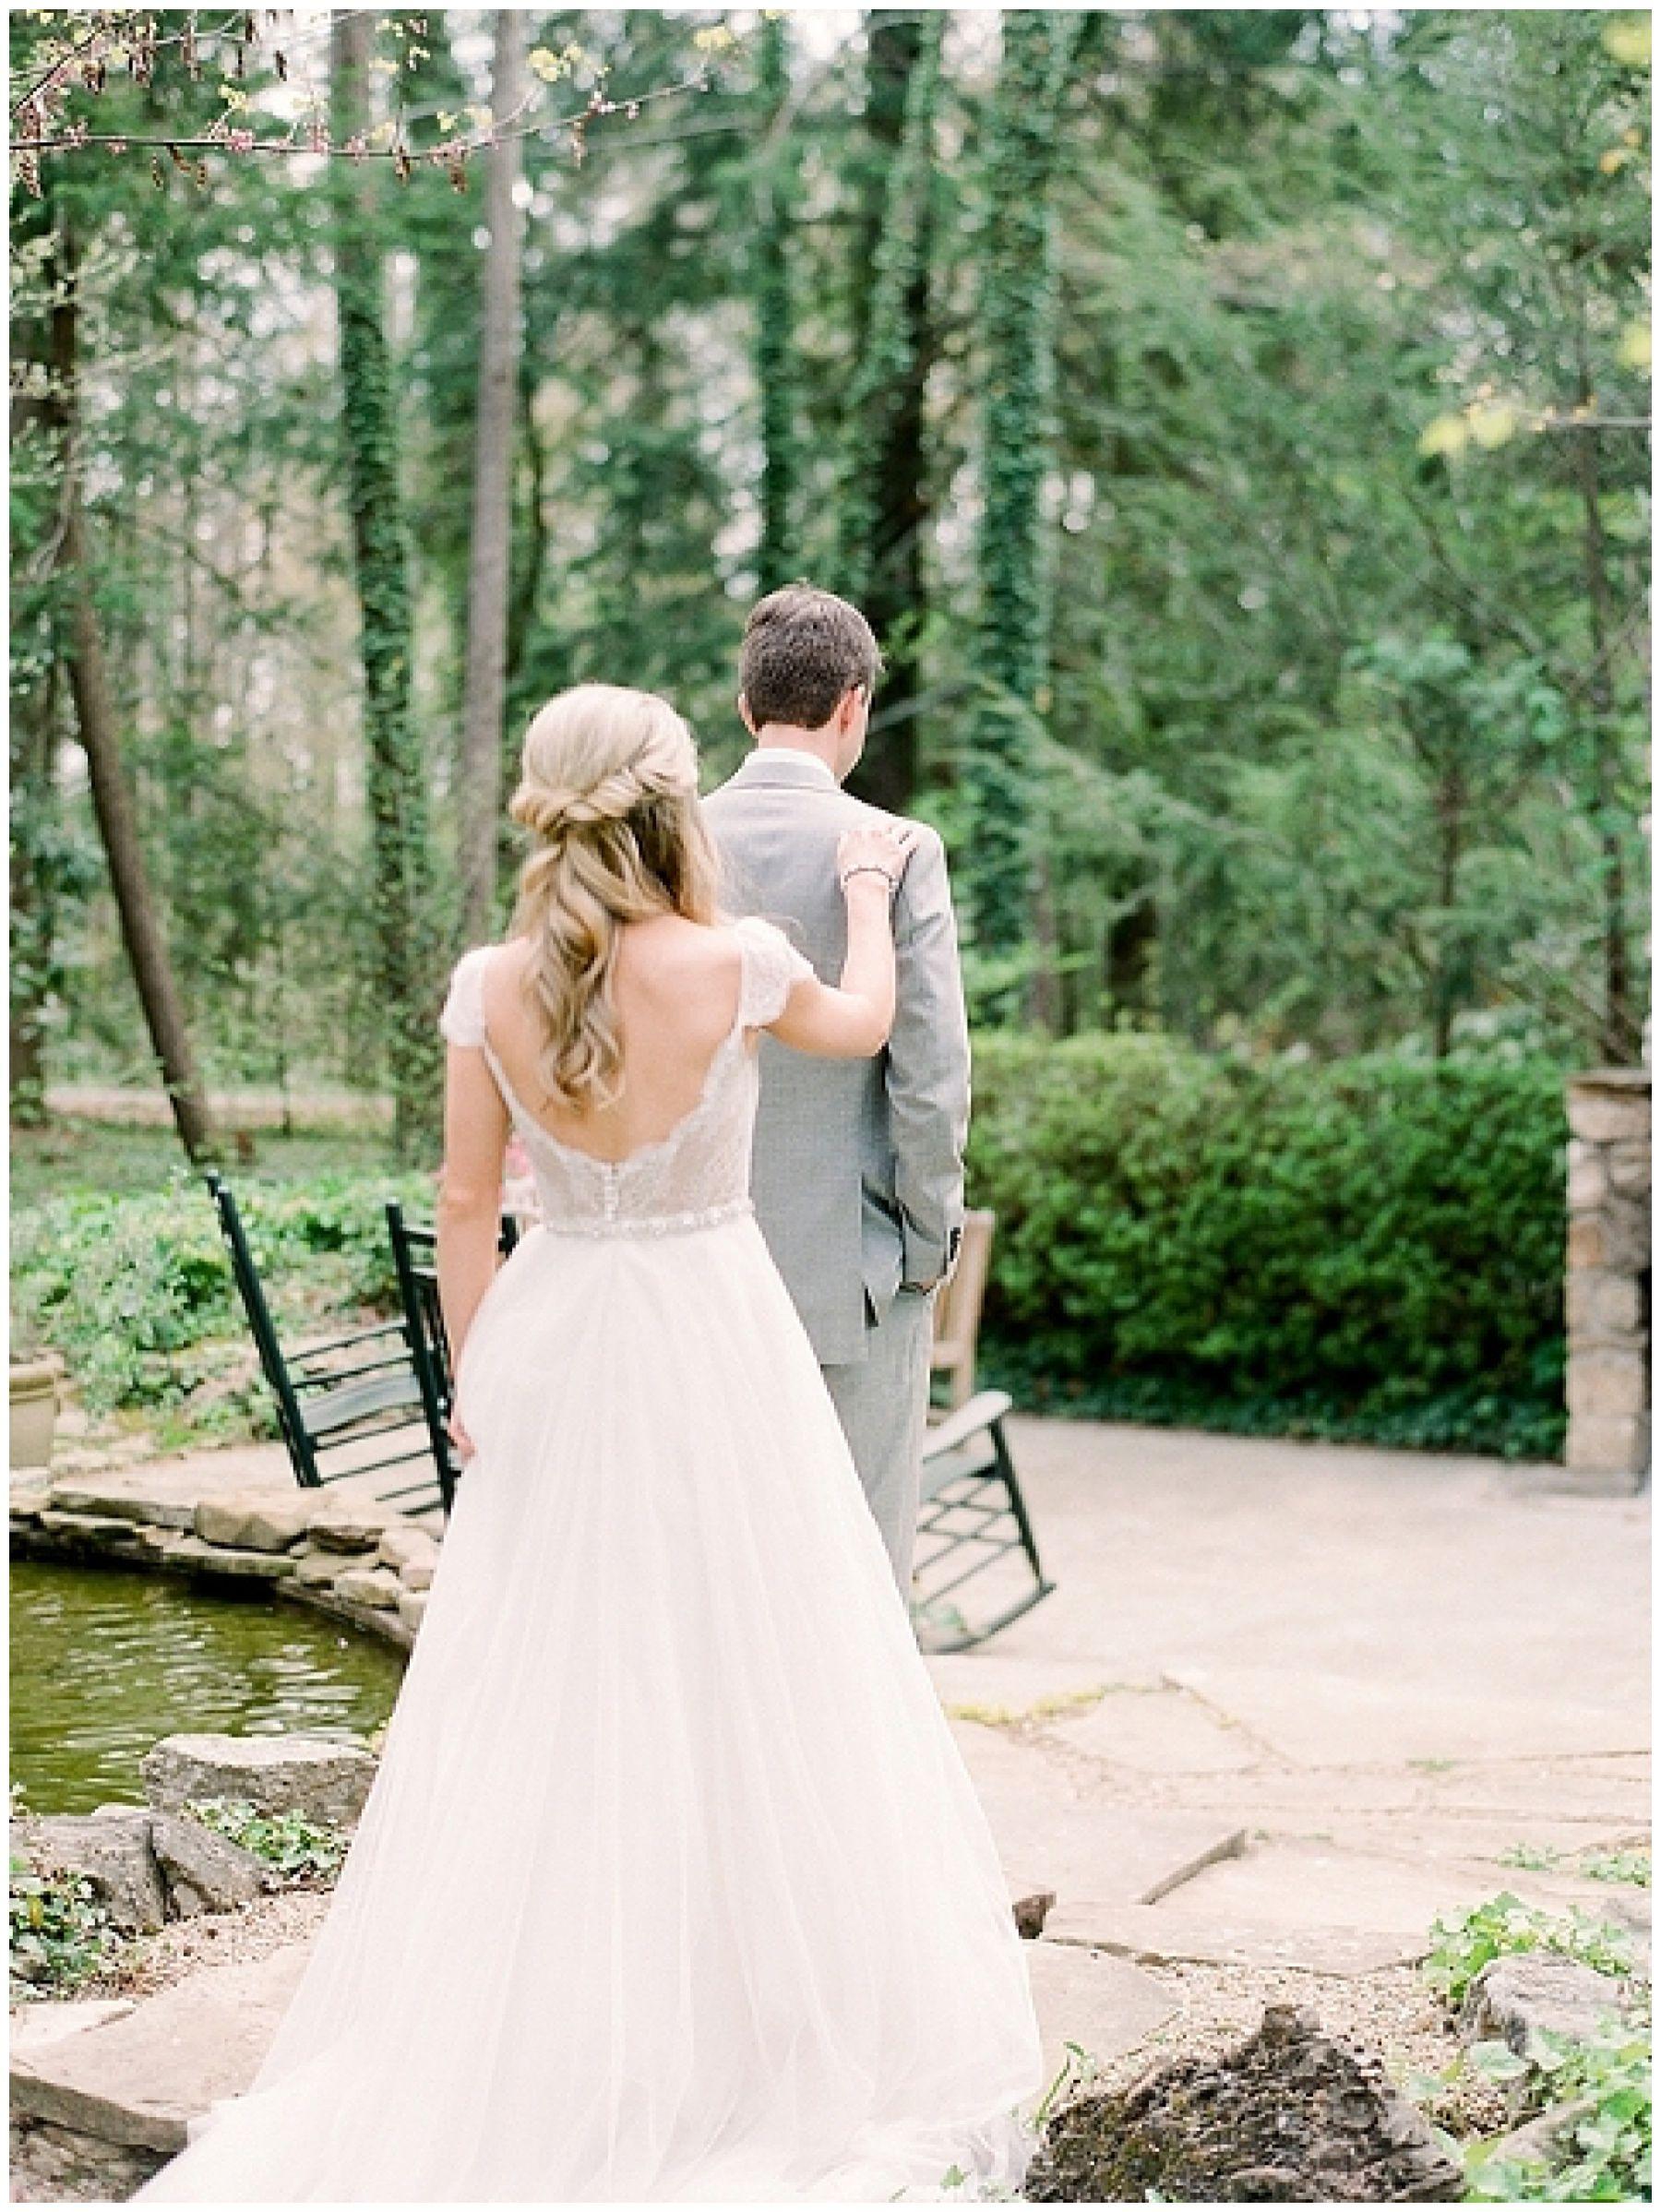 Our Favorite Southeast Wedding Destinations Invevents Com Destination Wedding Wedding Tent Design